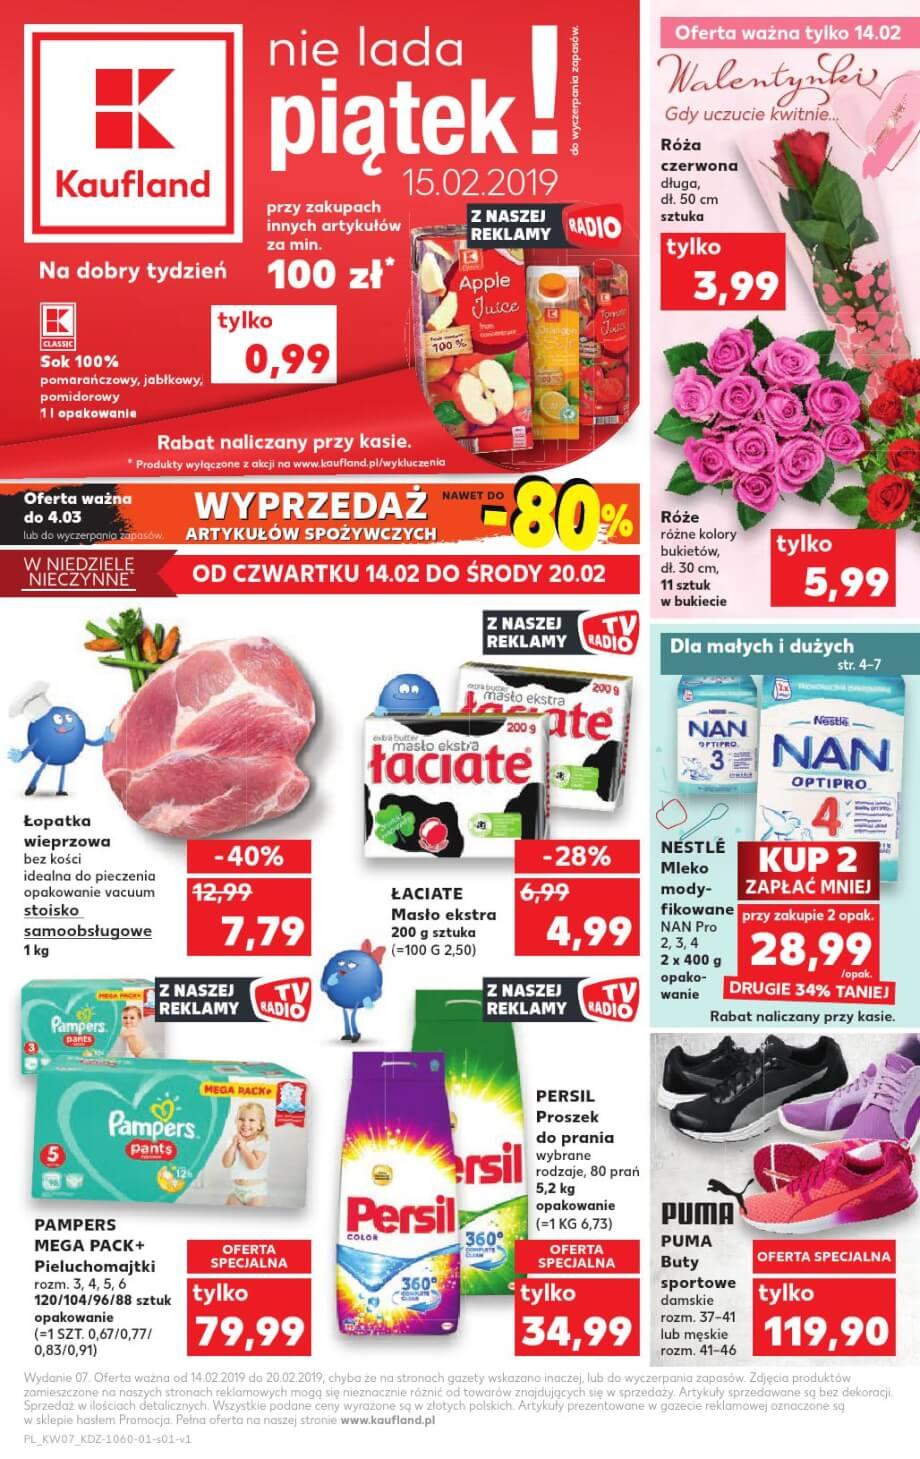 Kaufland, gazetka do 20.02.2019